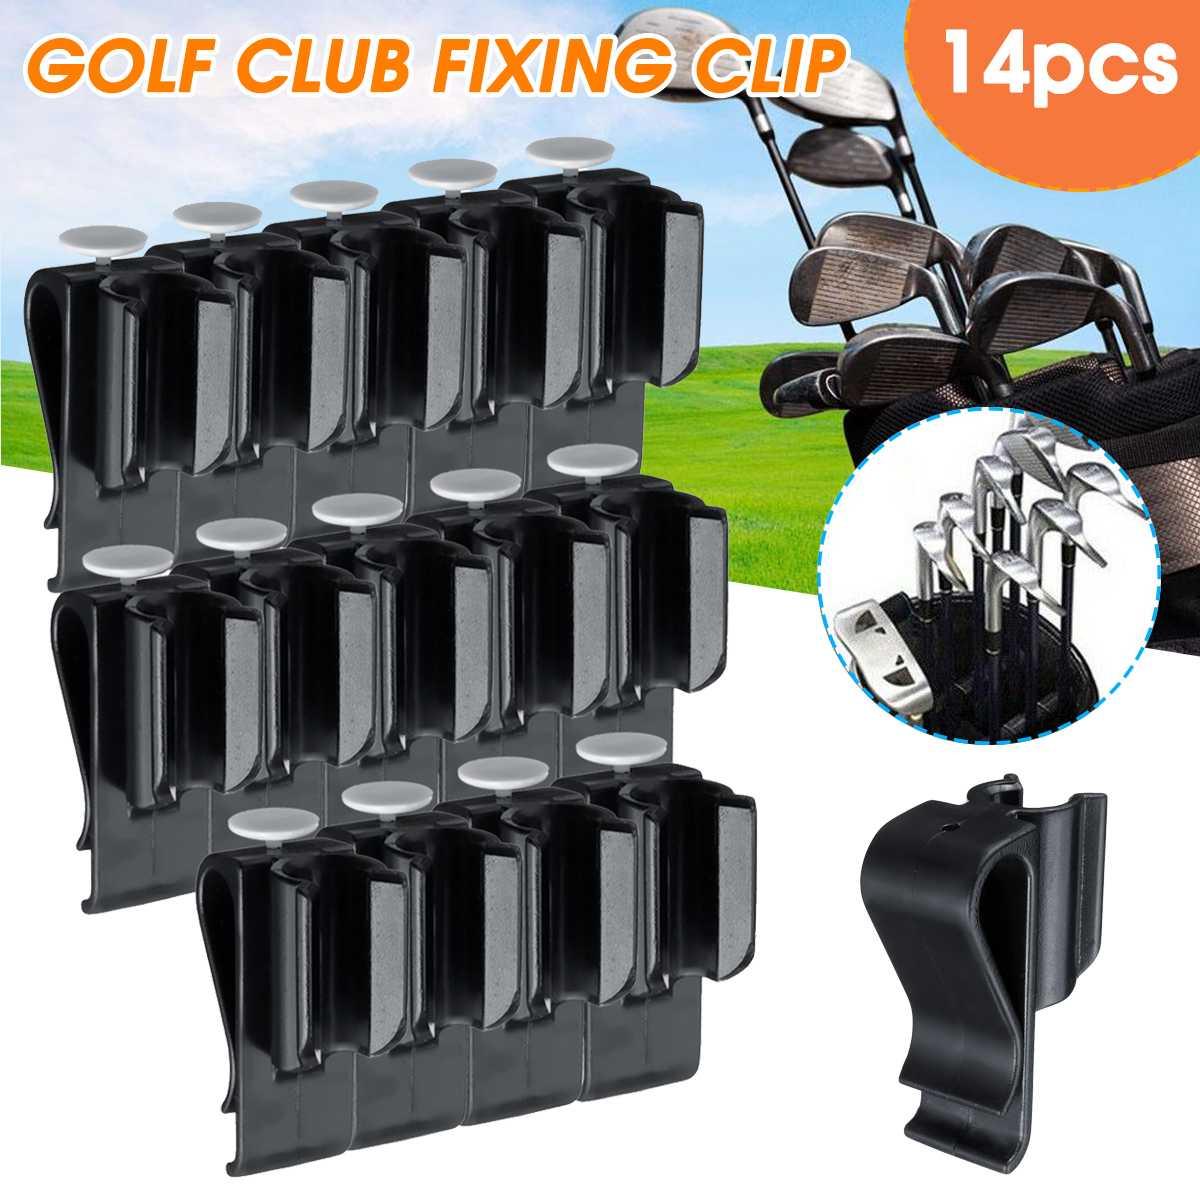 Premium 14 Pcs Sports Golf Bag Clip On Putter Clamp Holder Putting Organizer Club Golf Club Grips Golf Equipment